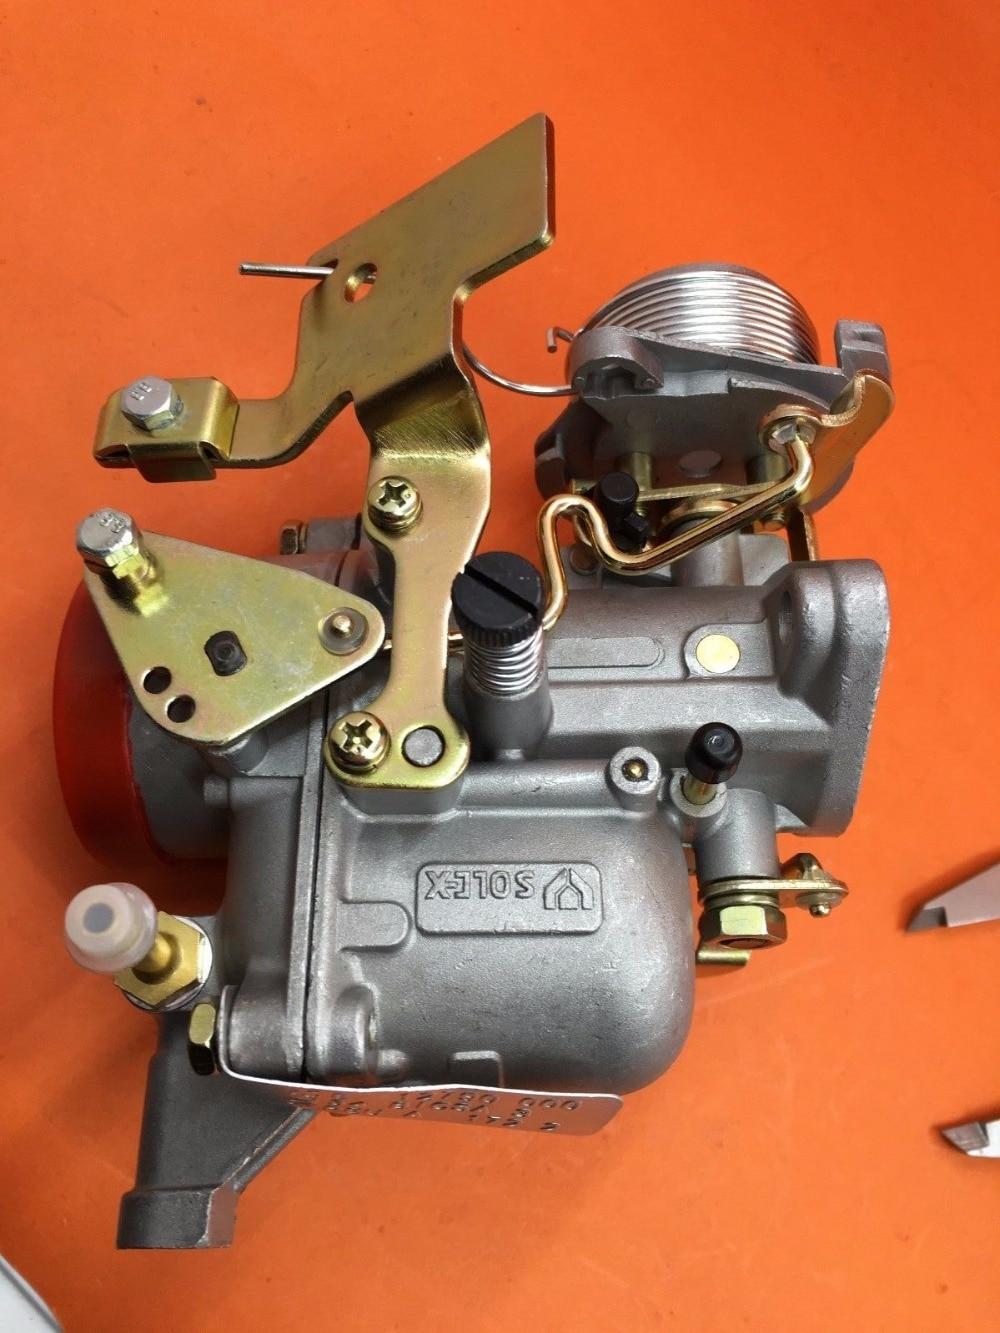 New replacement carb/Carburettor for peugeot 404/504 Solex 34 BICSA 3